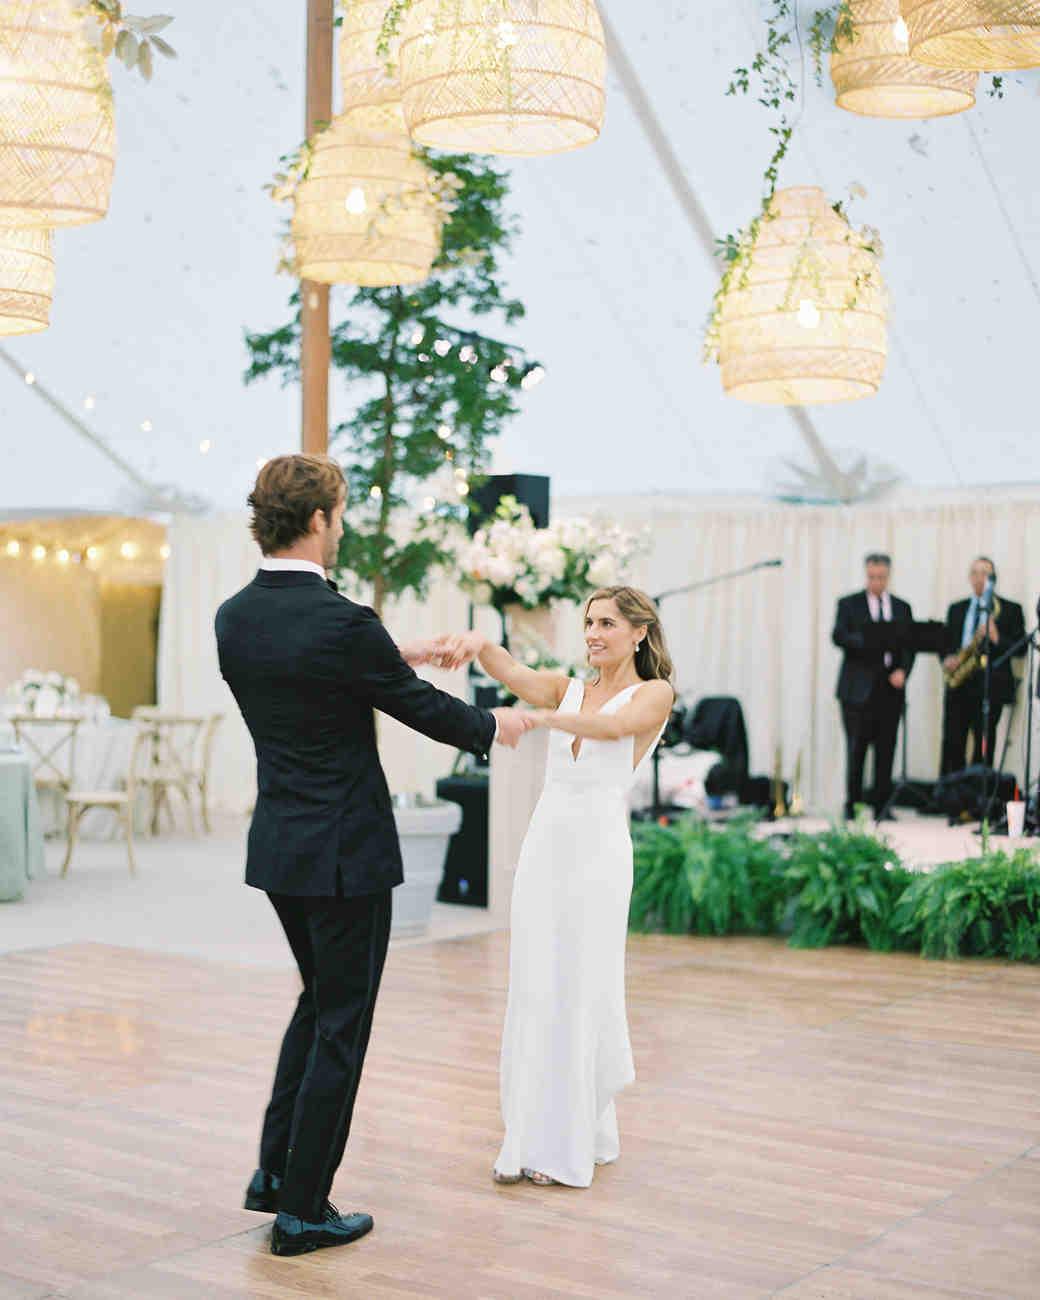 lauren alex wedding first dance